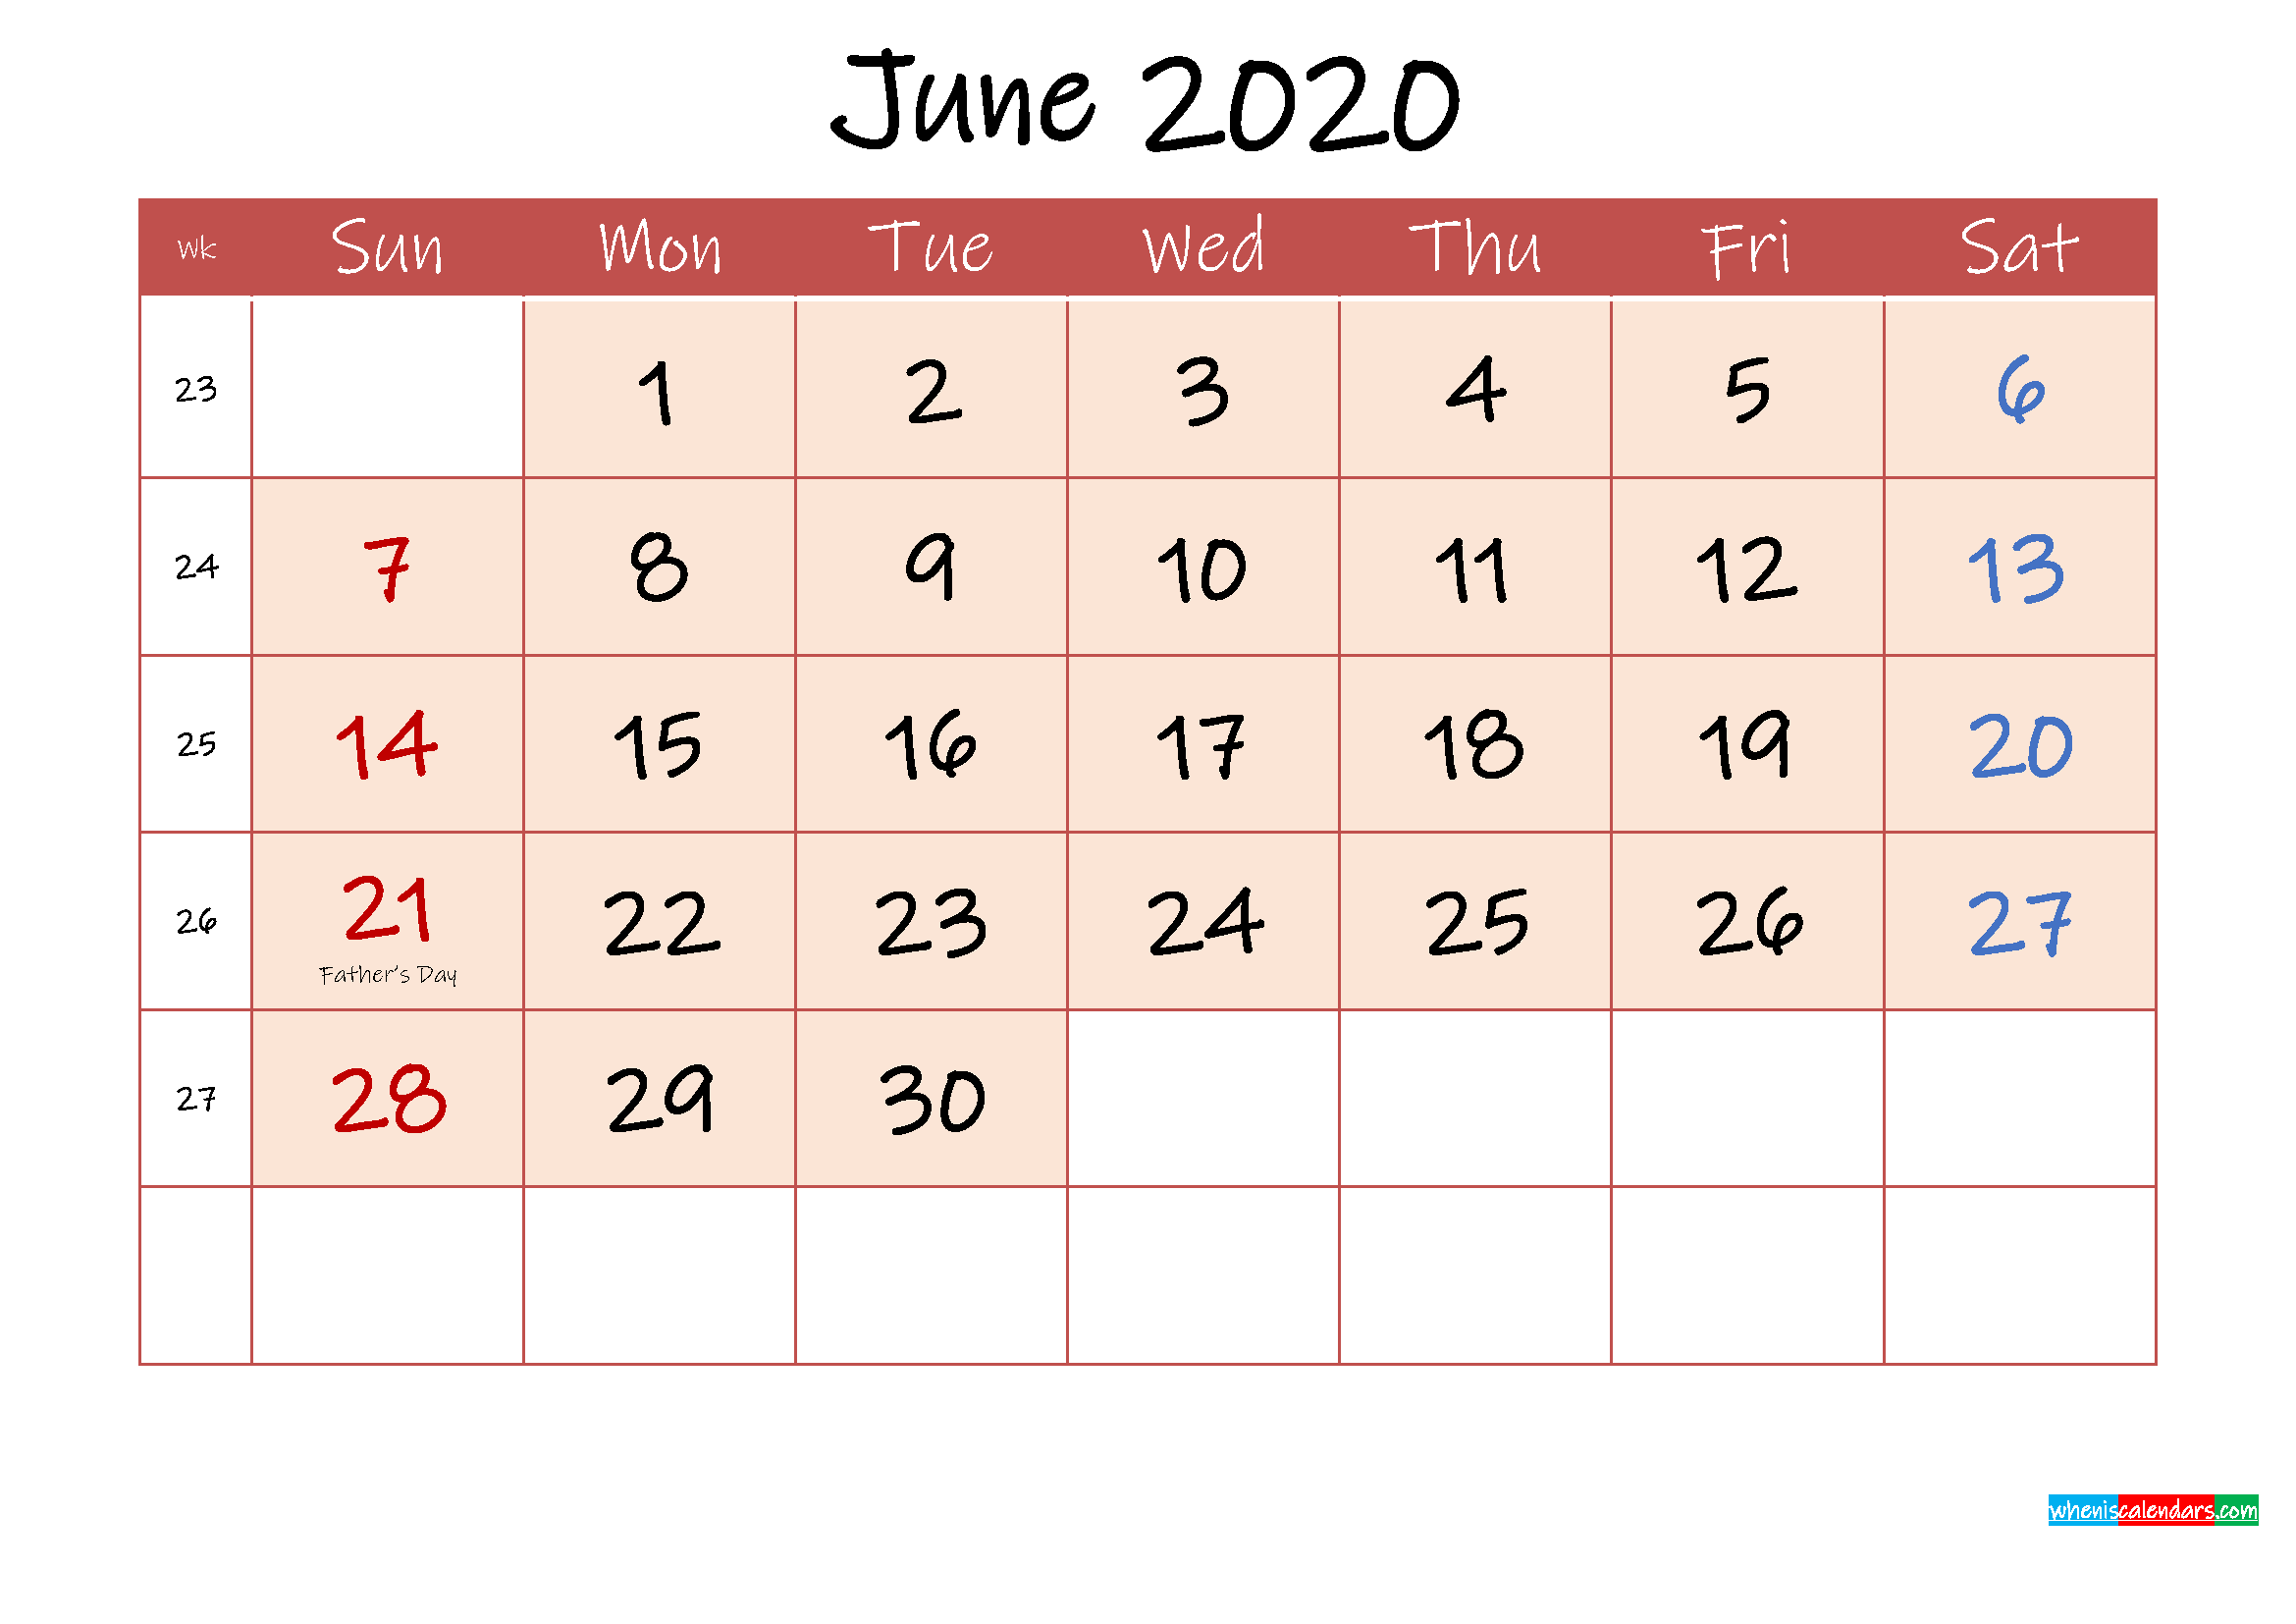 June 2020 Free Printable Calendar with Holidays